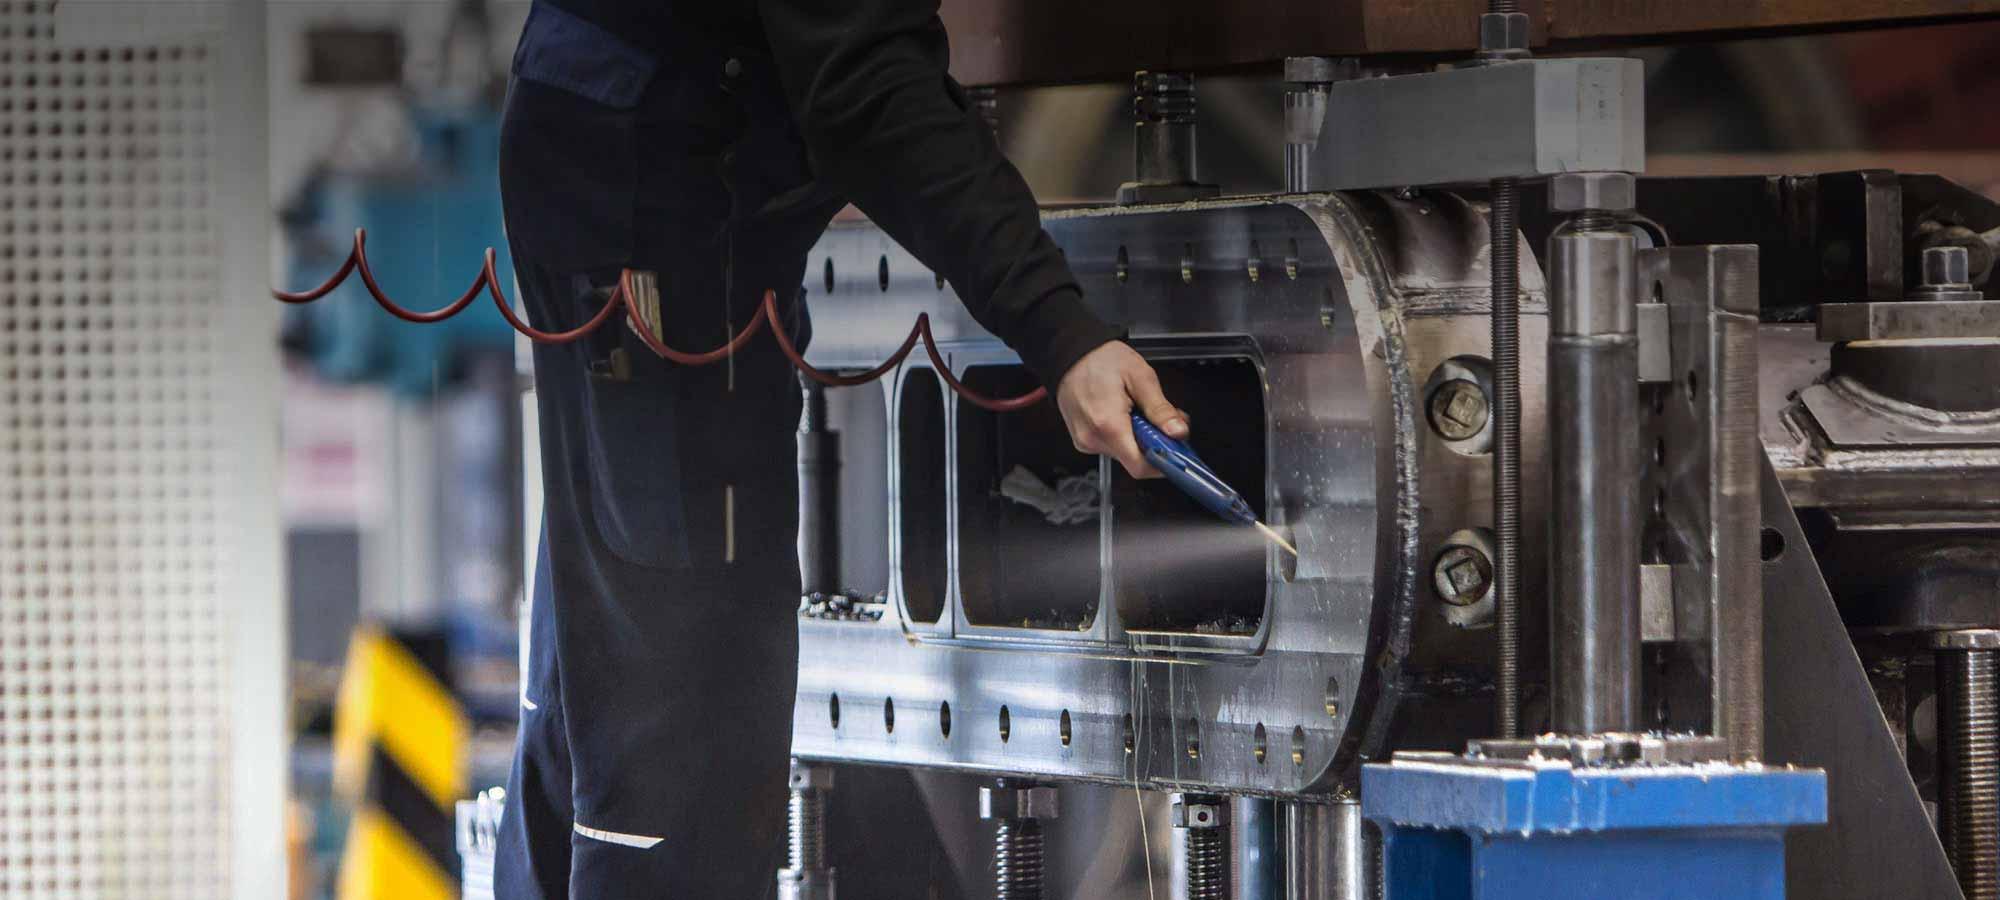 Mechanische Fertigung und Großteilebearbeitung